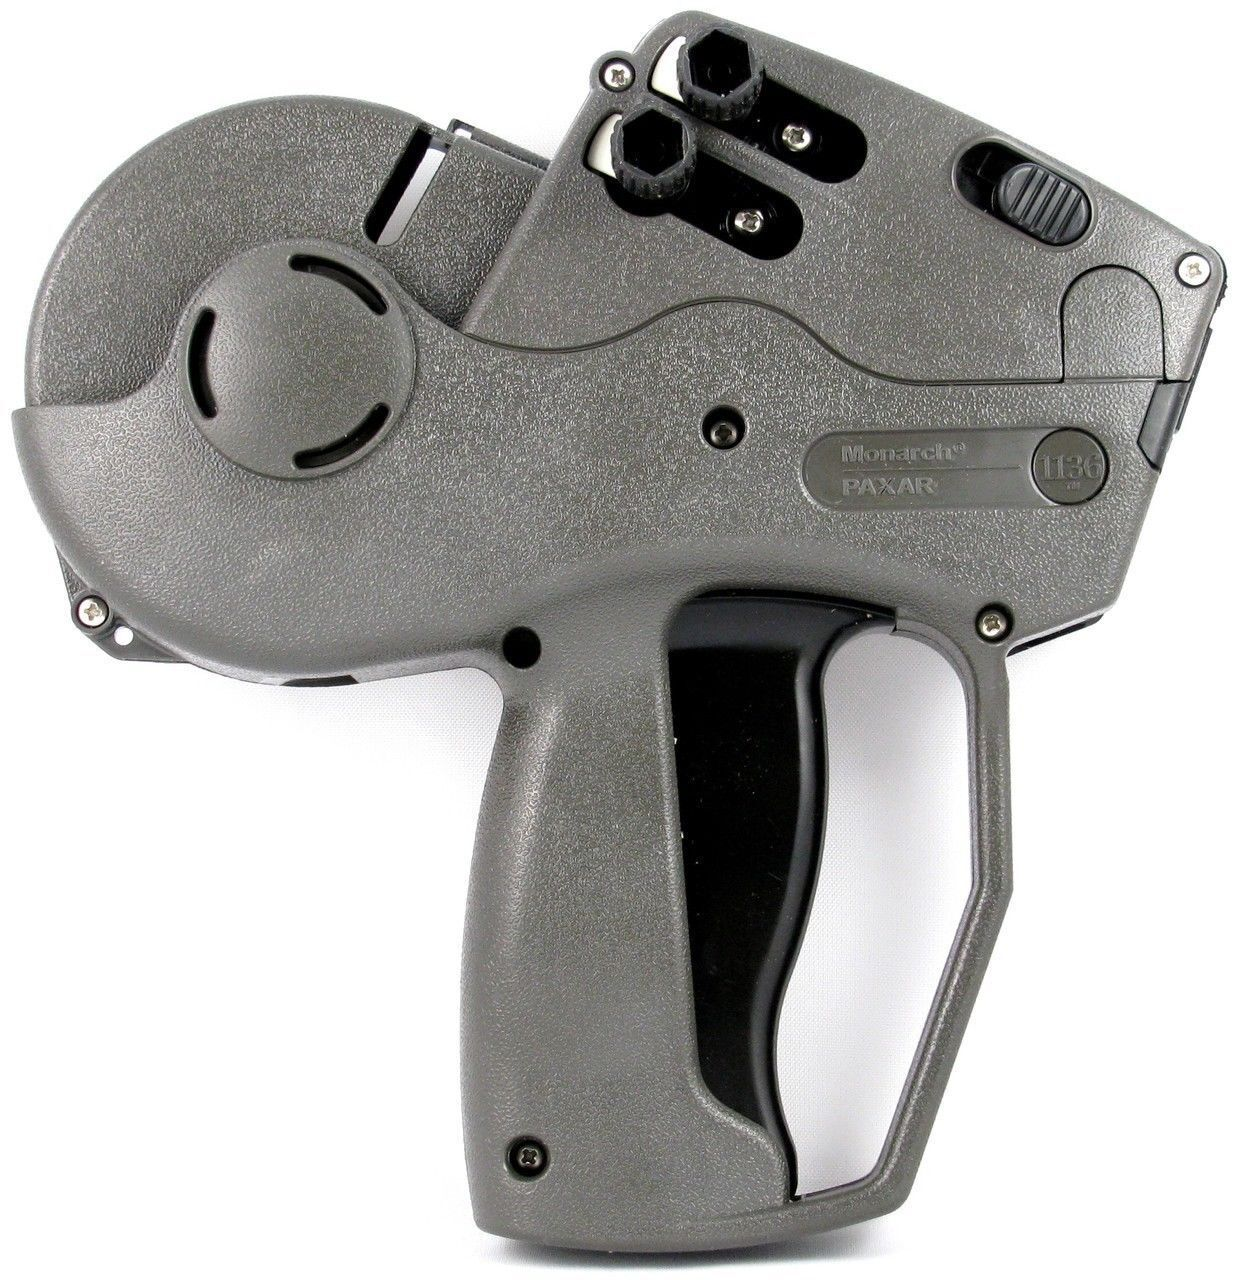 Monarch Paxar Avery 1136 Price Gun Pricing Labeller